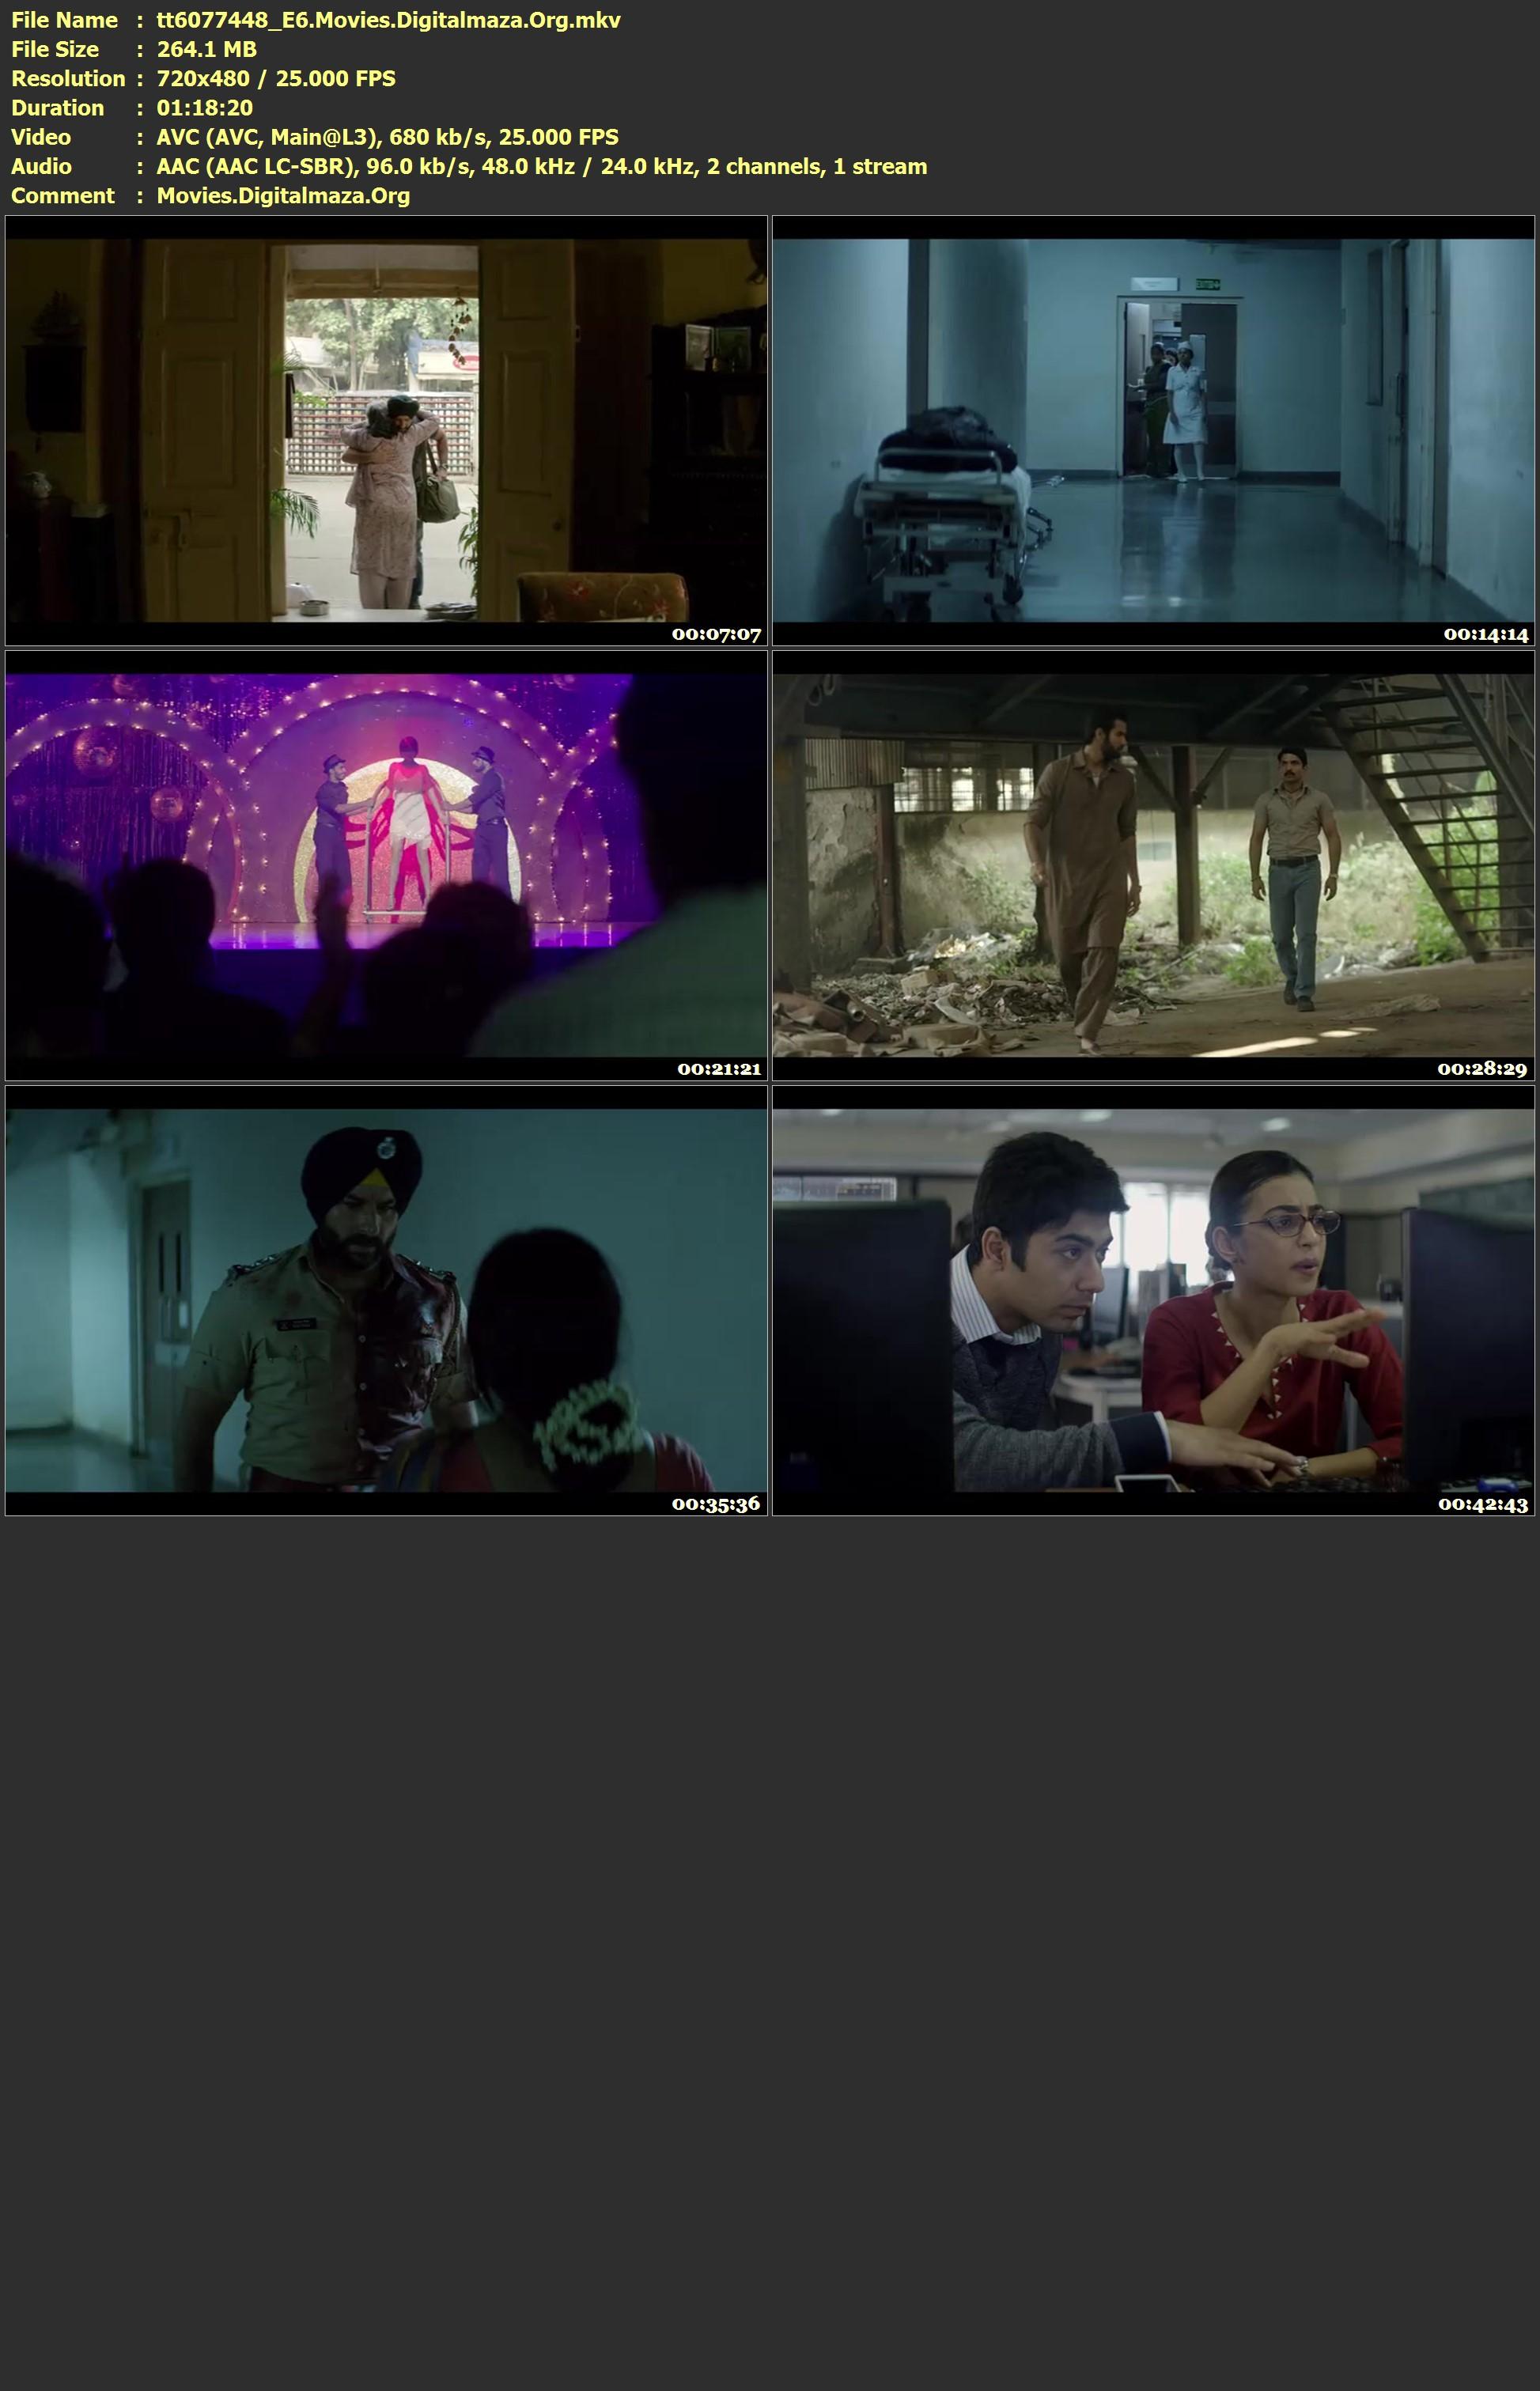 https://image.ibb.co/m3fKjy/tt6077448_E6_Movies_Digitalmaza_Org_mkv.jpg